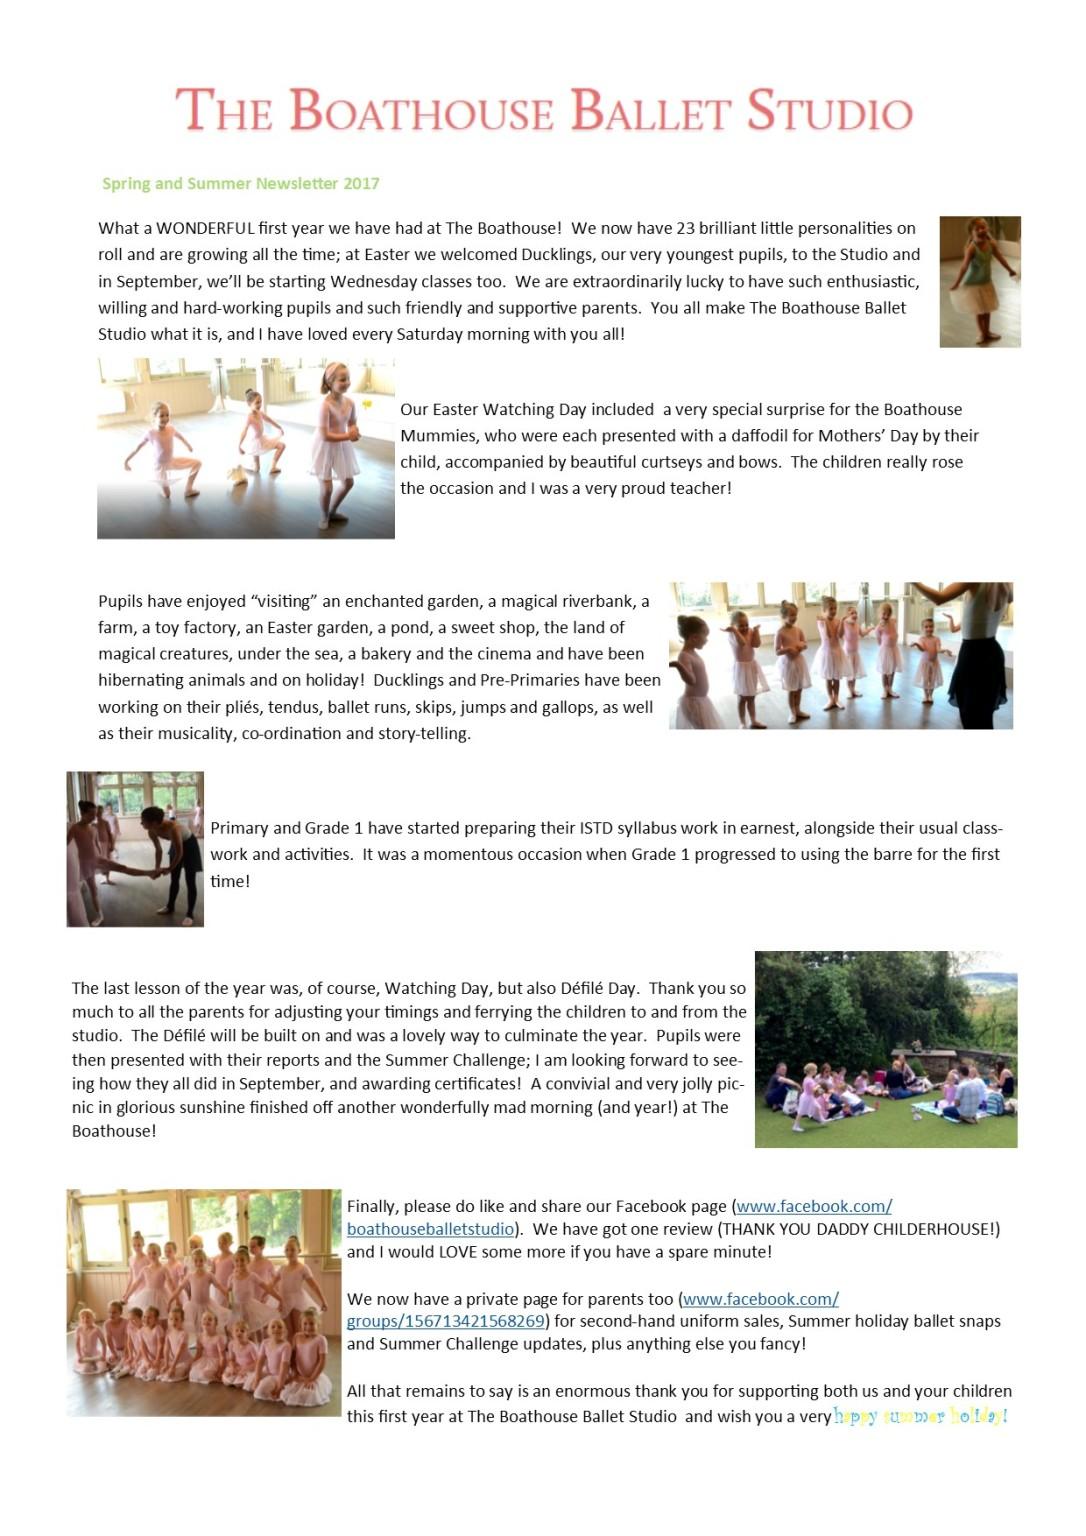 Newsletter Summer 2017 as image